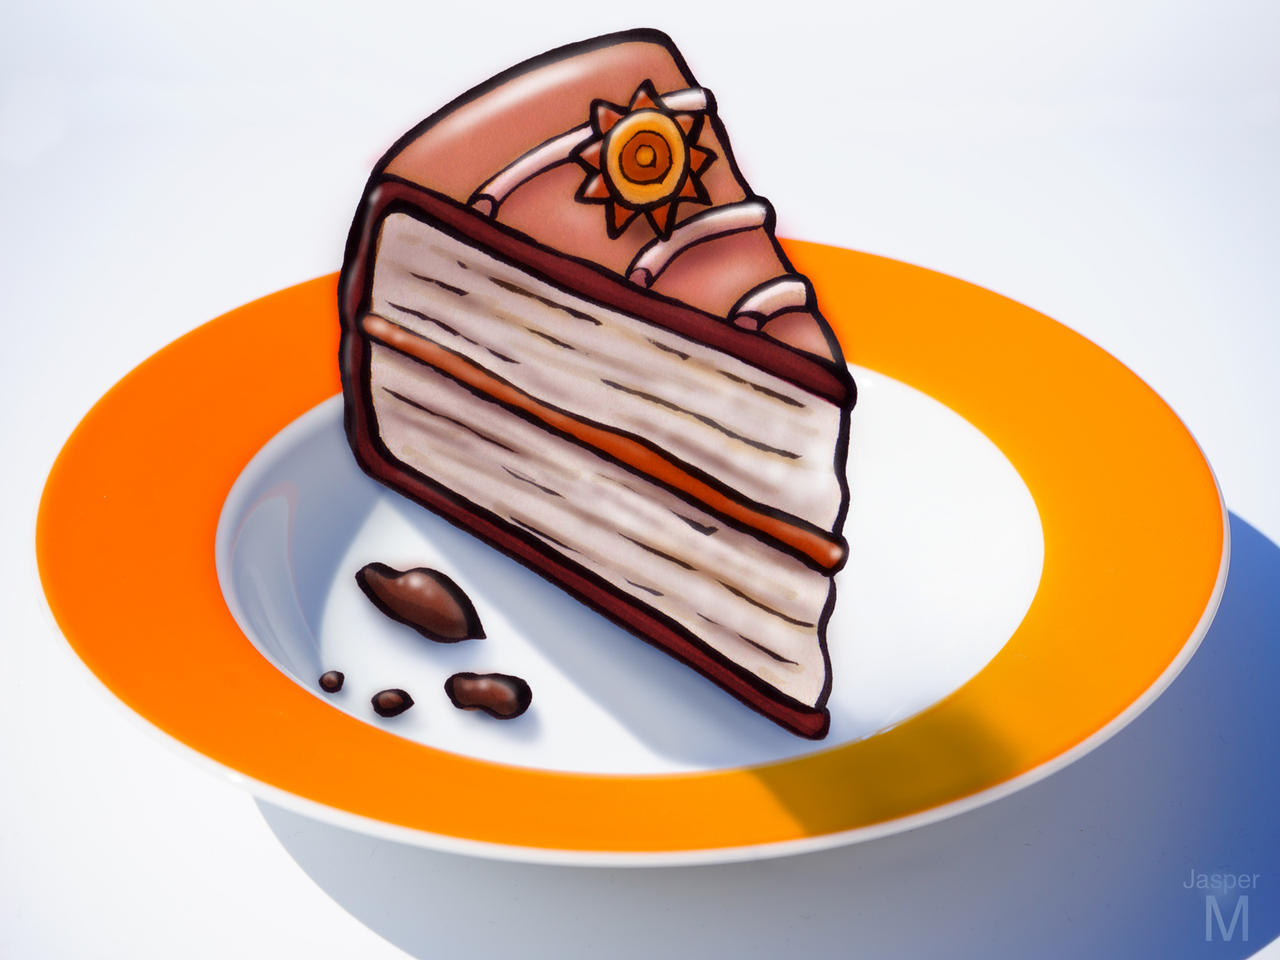 Cake (word no. 70)